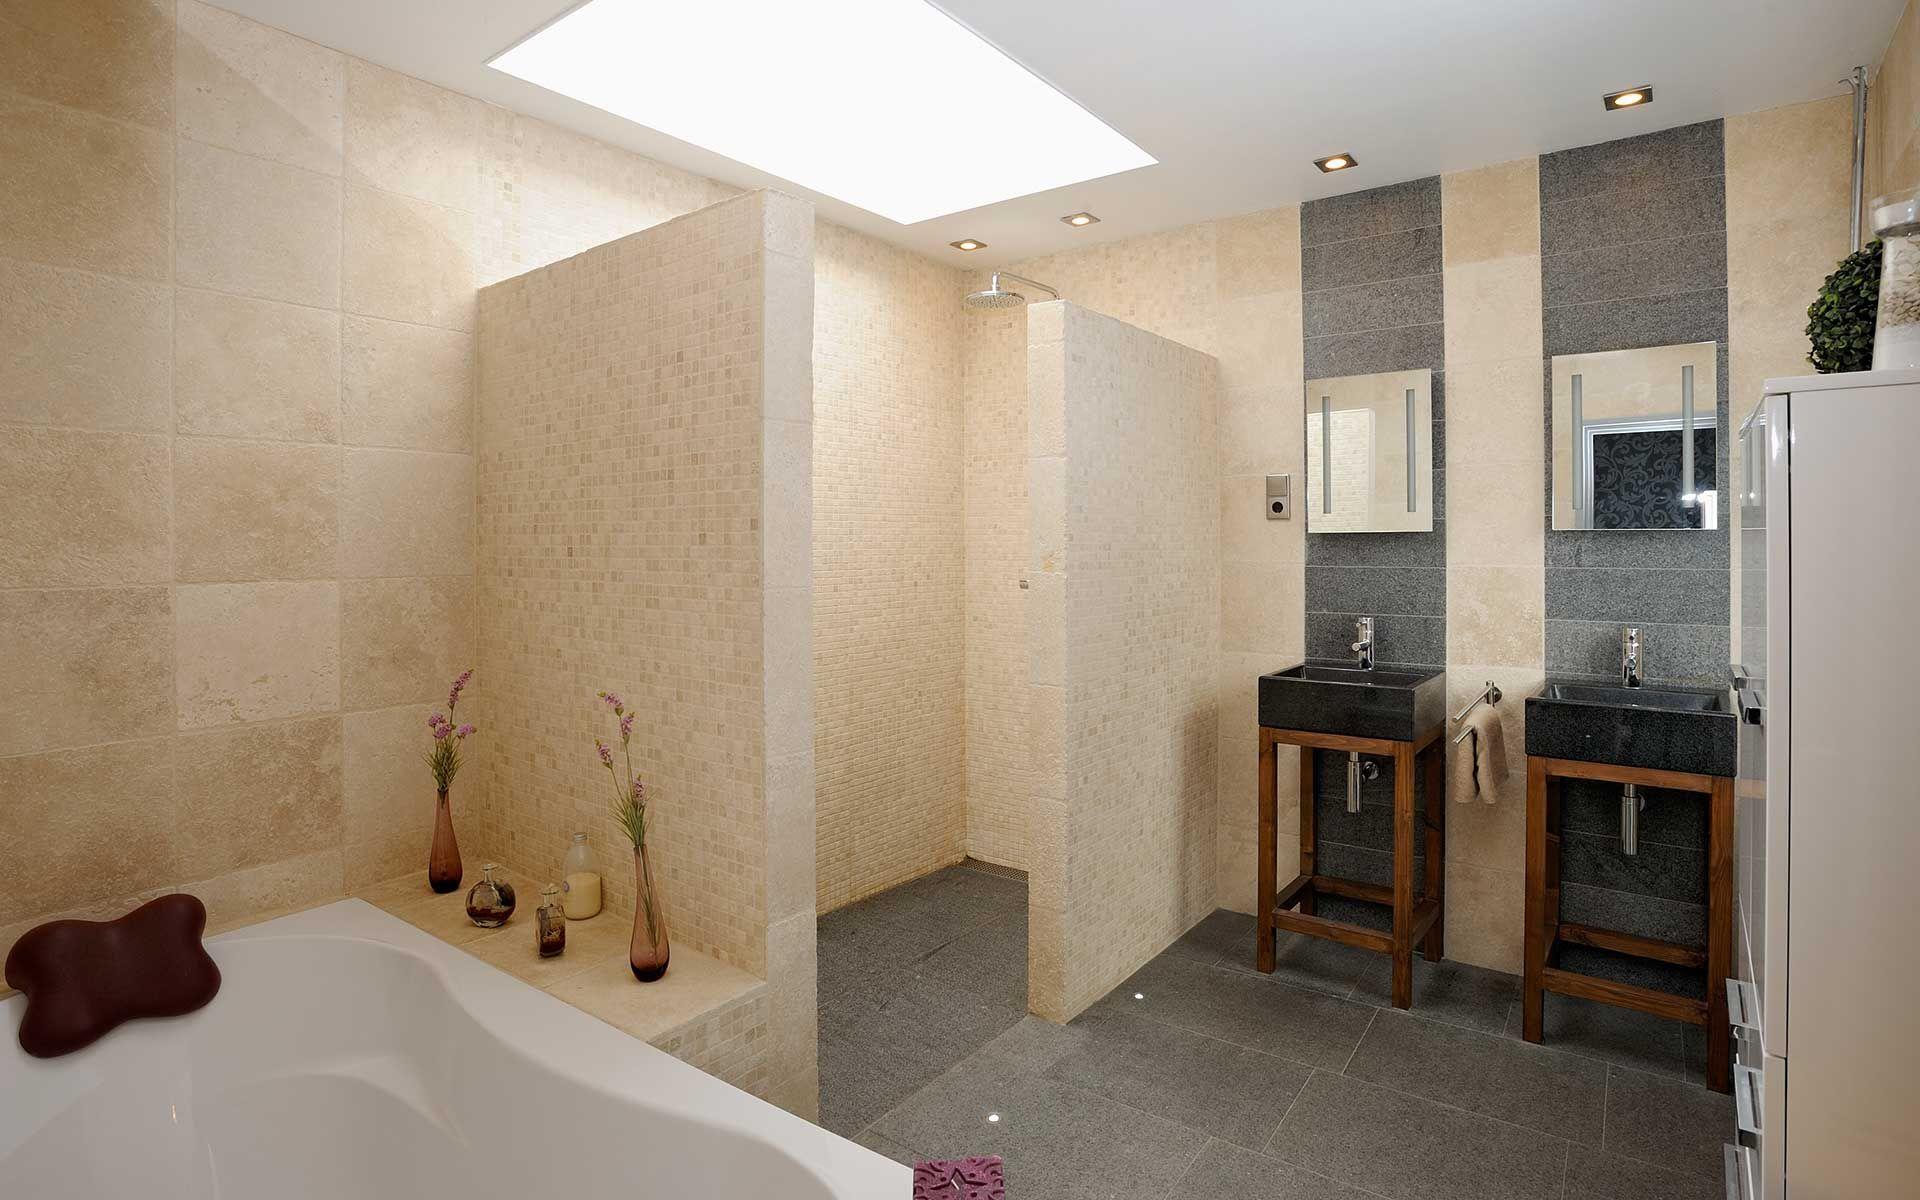 Travertin Tegels Badkamer : Badkamer #travertin #bathroom prachtige badkamers pinterest